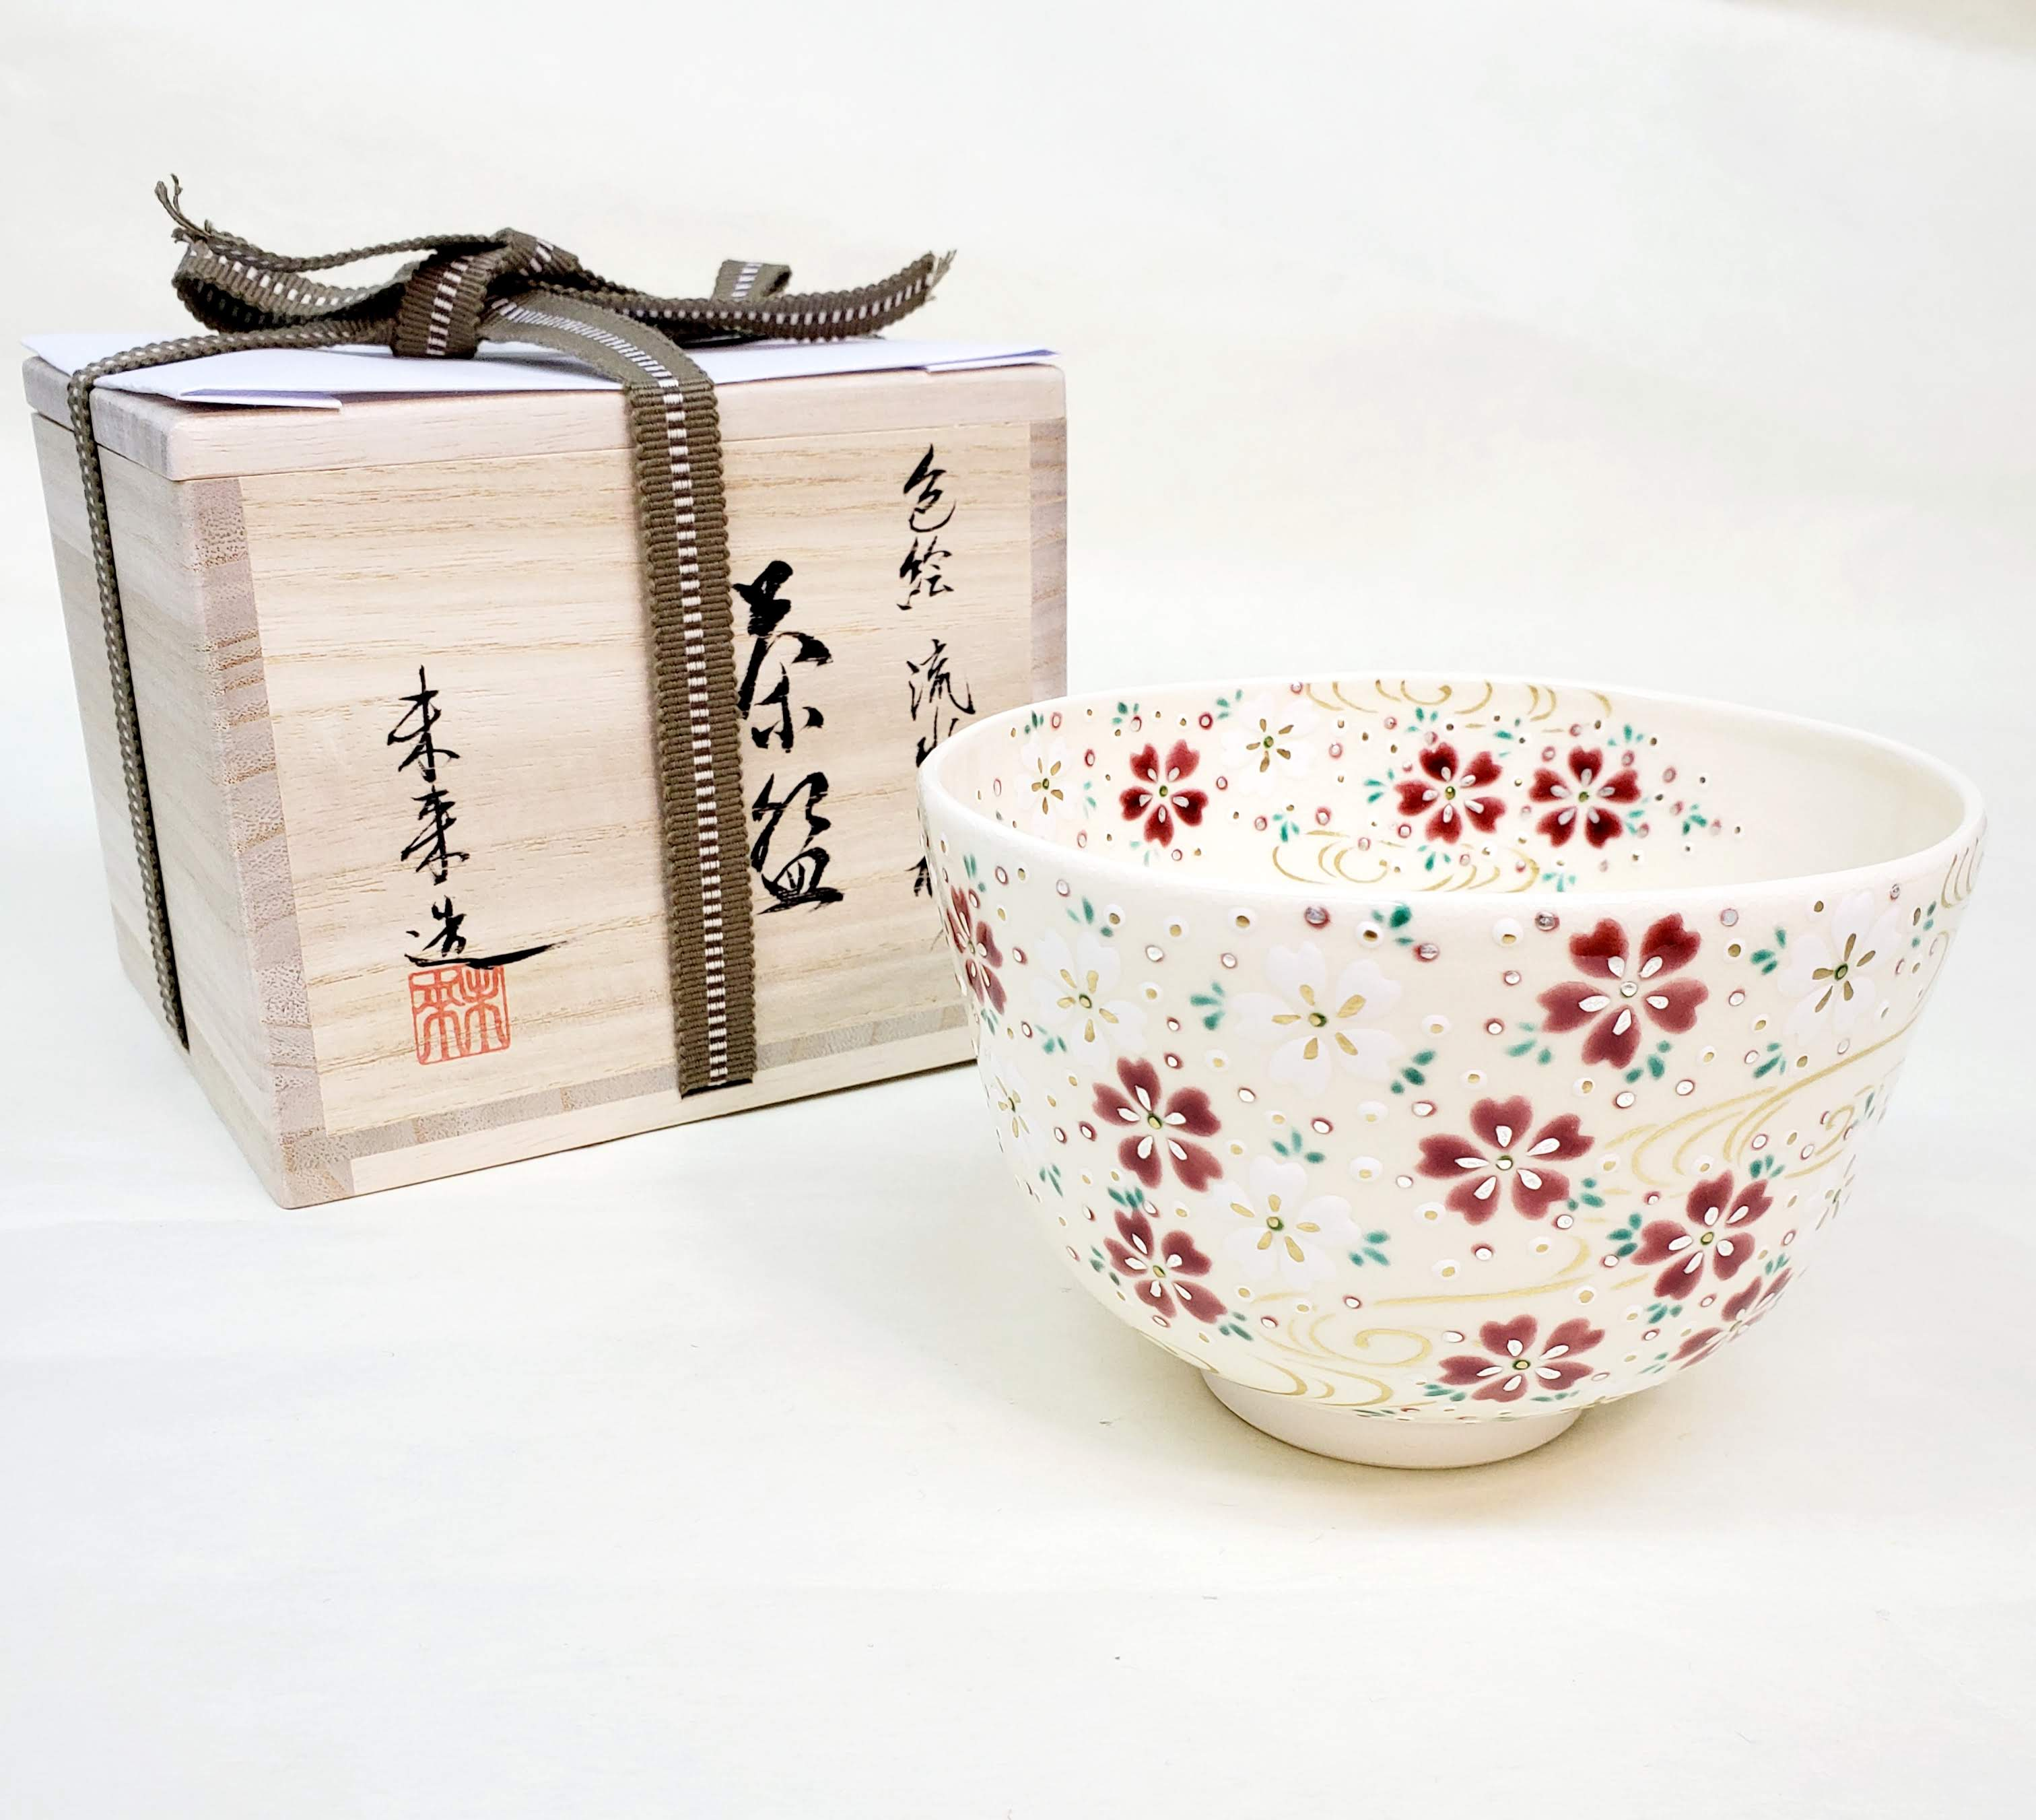 茶碗 流水に桜 福本未来